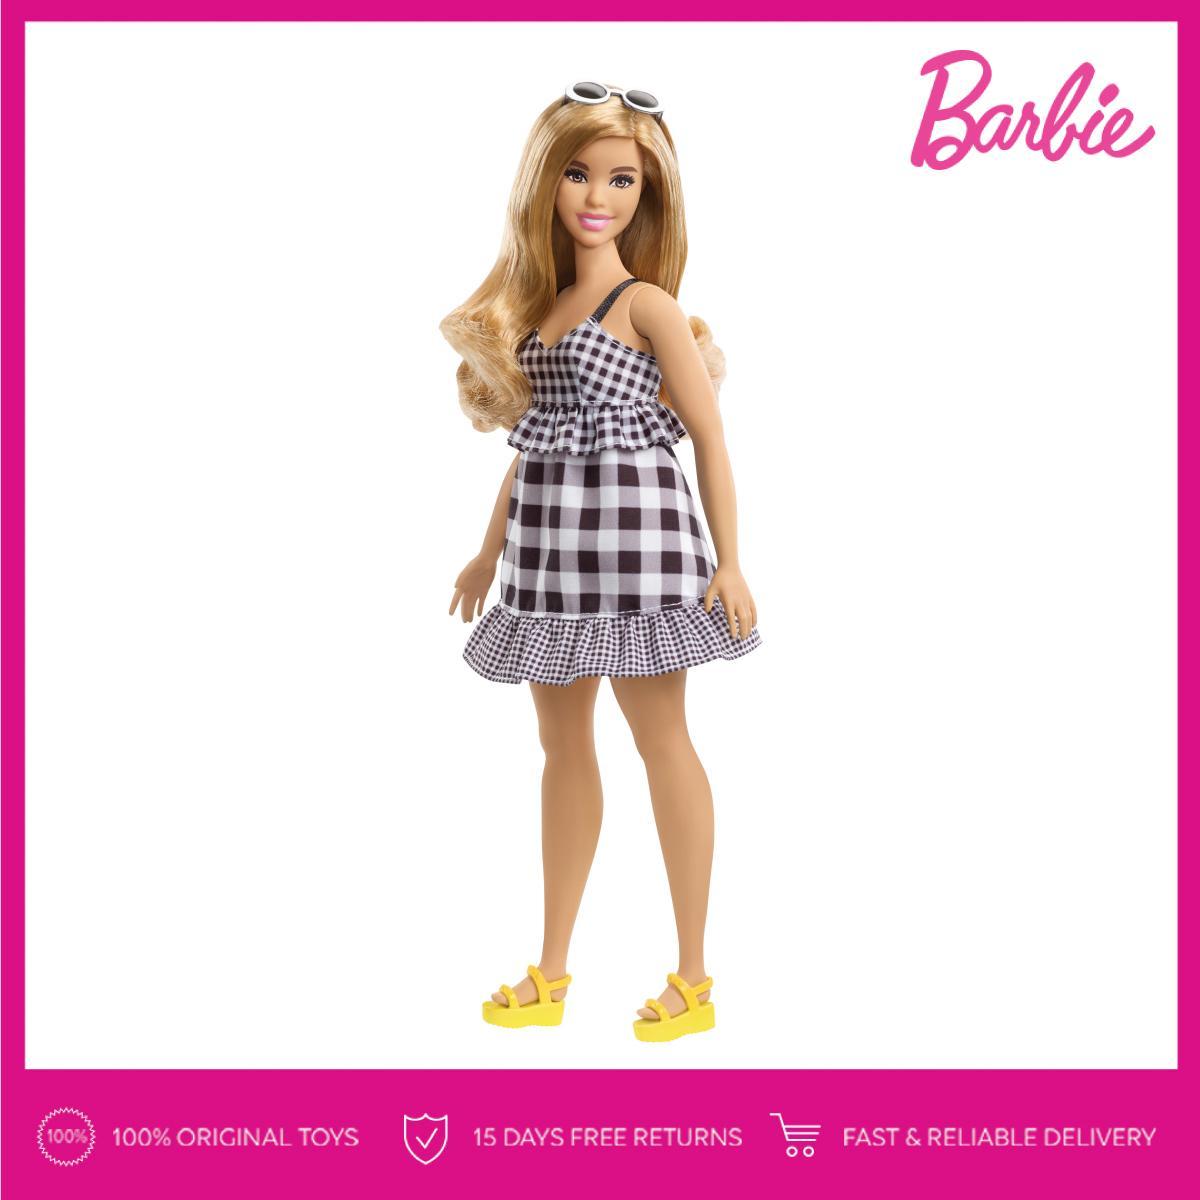 Barbie Fashionistas Doll 96 – Curvy with Dark Blonde Hair Boneka Mainan  Anak Perempuan 7045fc1bd3